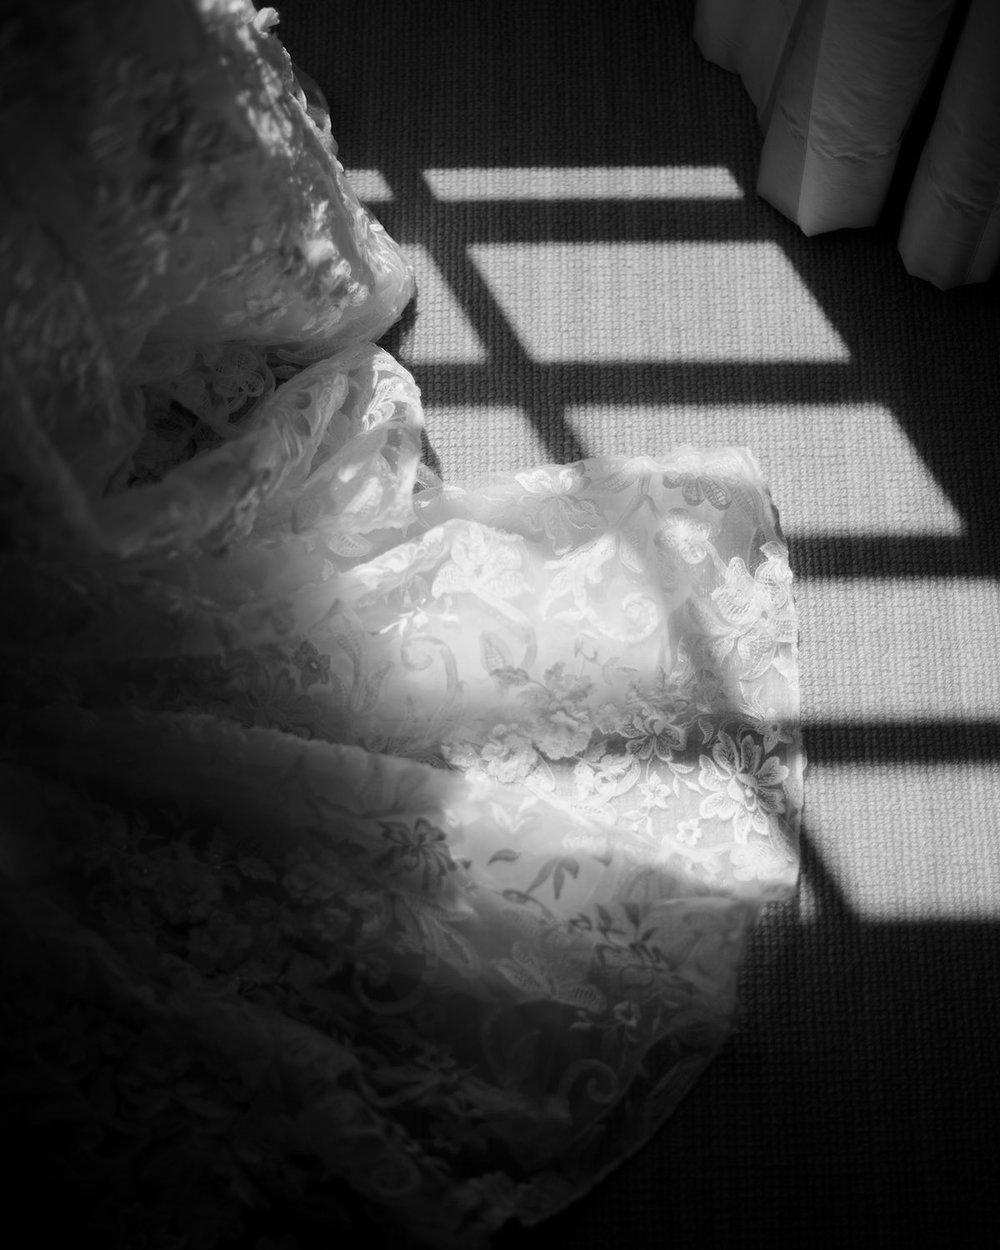 napa-wedding-michal-pfeil-09.jpg